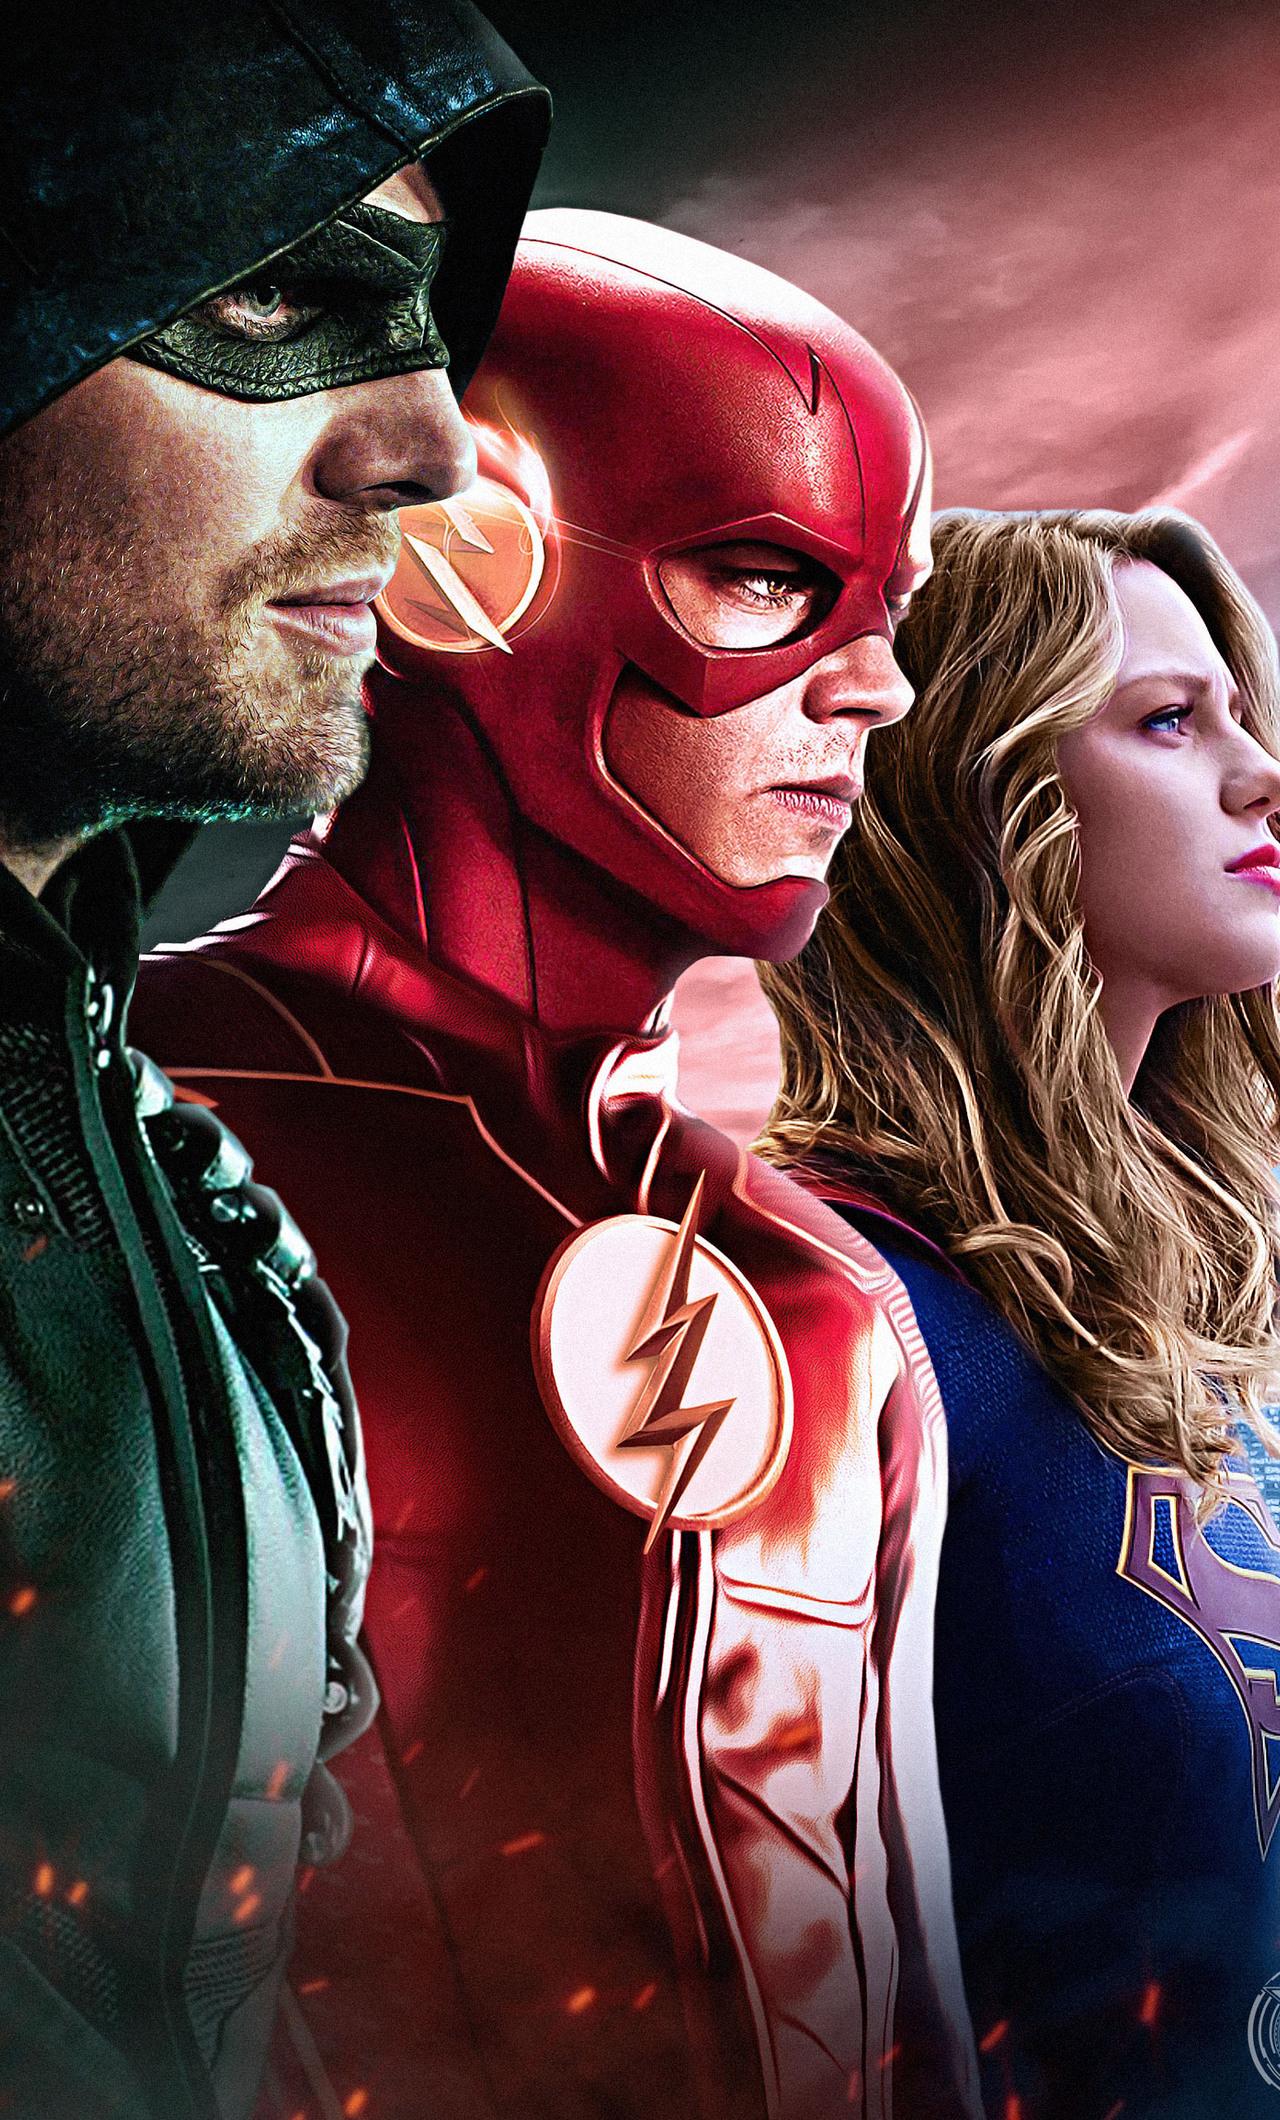 1280x2120 Dc Tv Arrow Flash Supergirl Iphone 6 Hd 4k Wallpapers